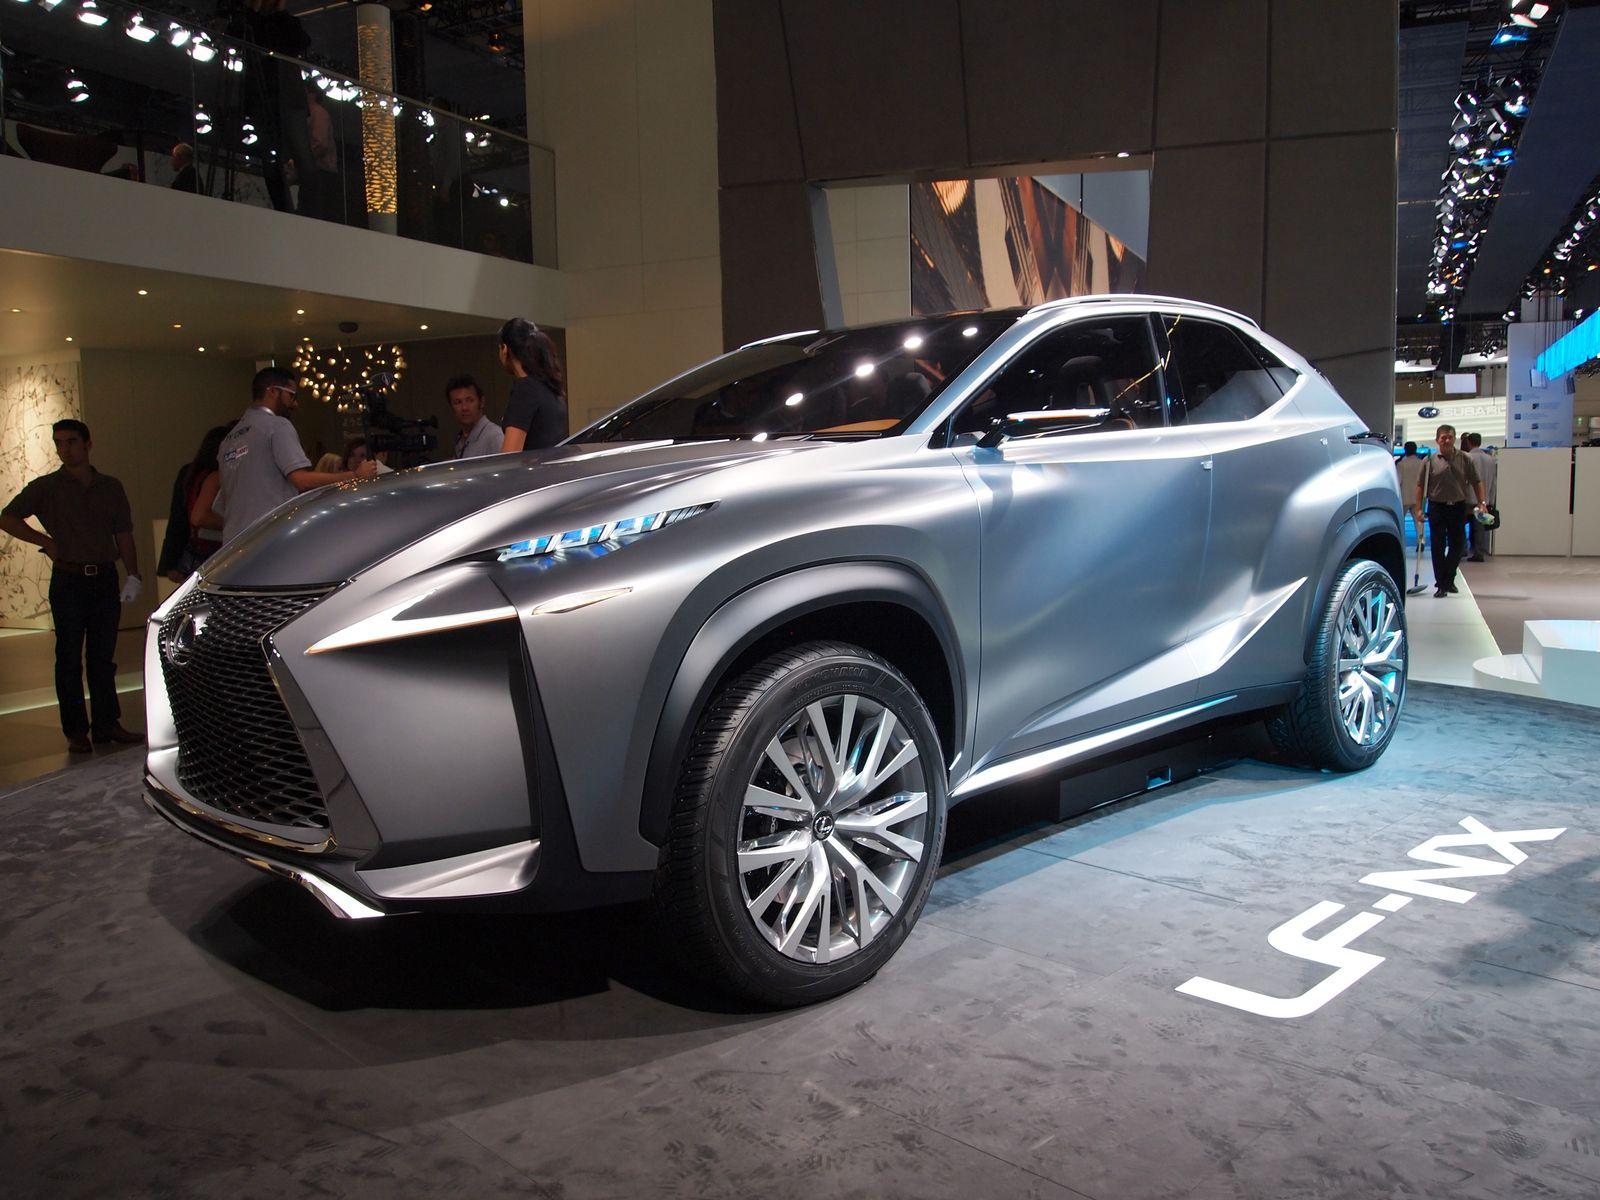 2013/ Blog/ IAA/ SUV-Modell/ Lexus LF-NX